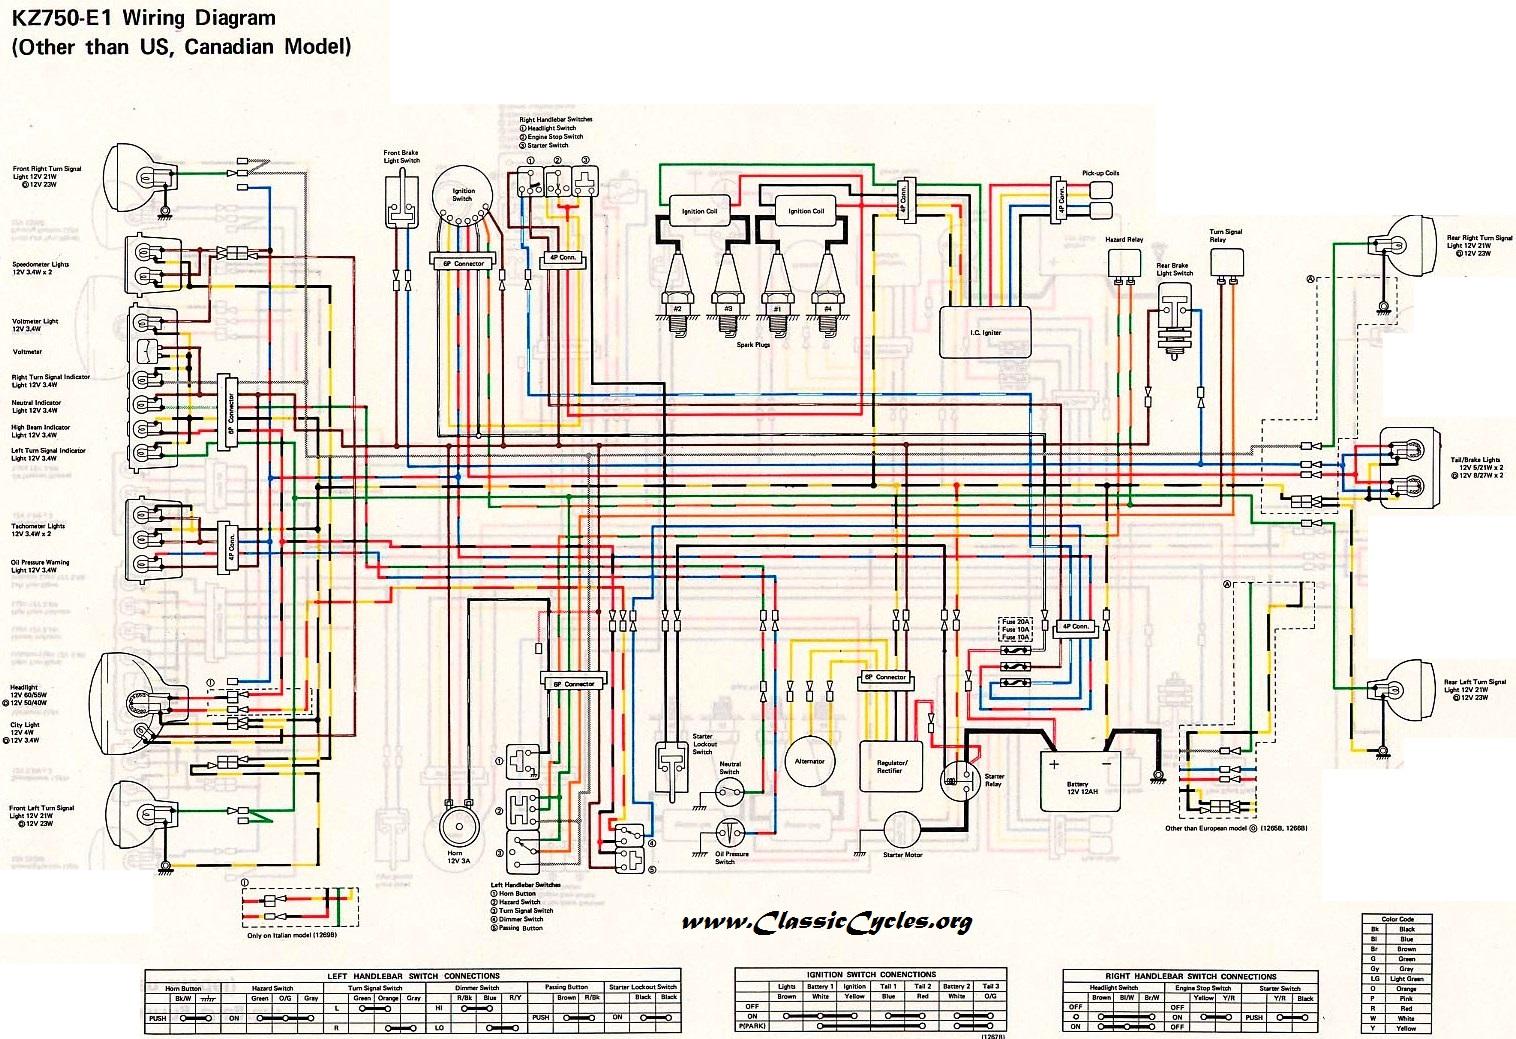 2016 kawasaki brute force 750 wiring diagram r33 skyline ignition 2007 best library vulcan 500 essig rh 16 tierheilpraxis de